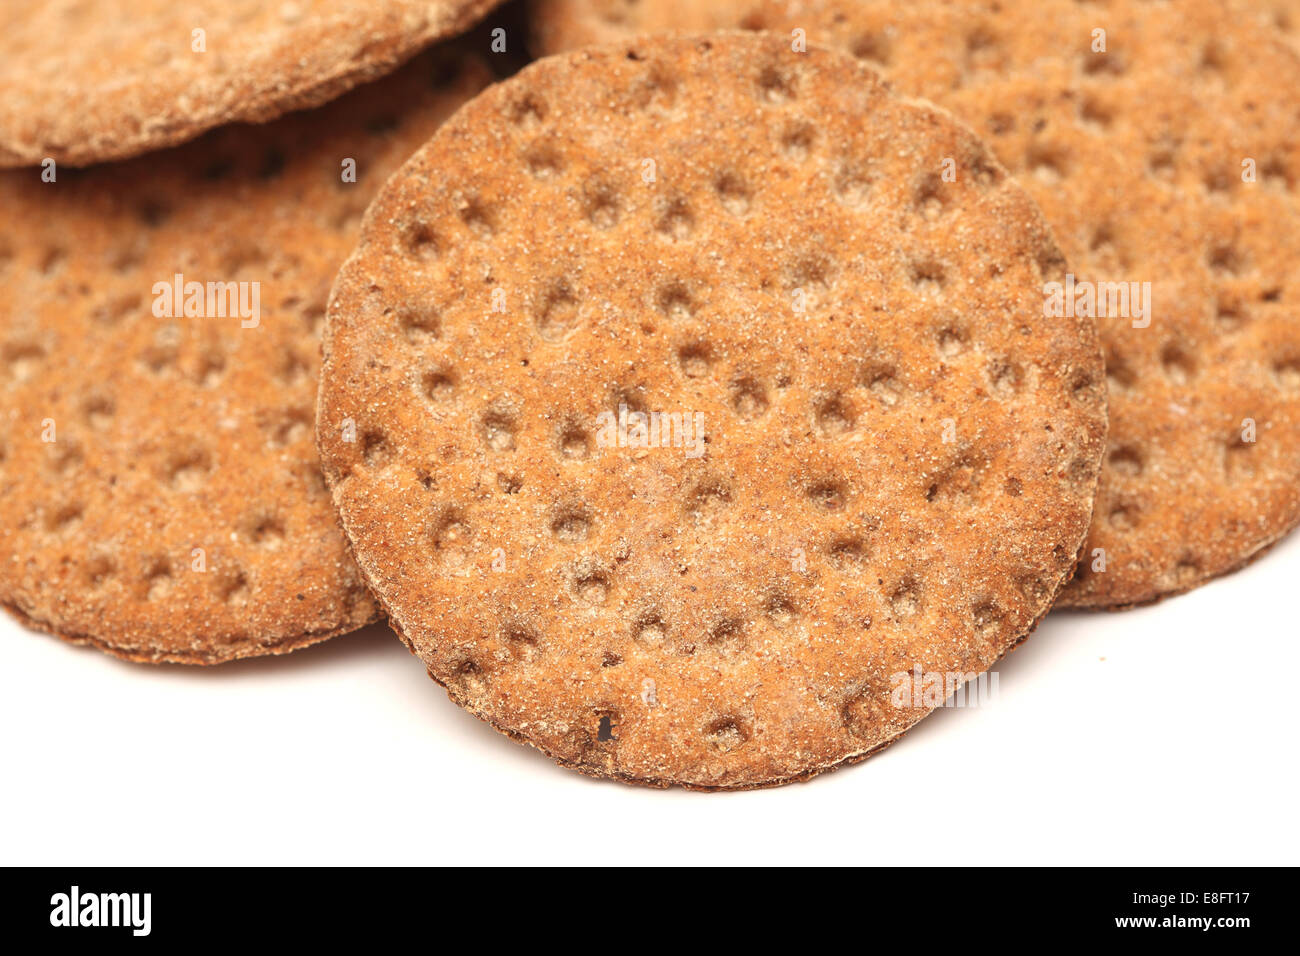 Round crispbread on a white background - Stock Image